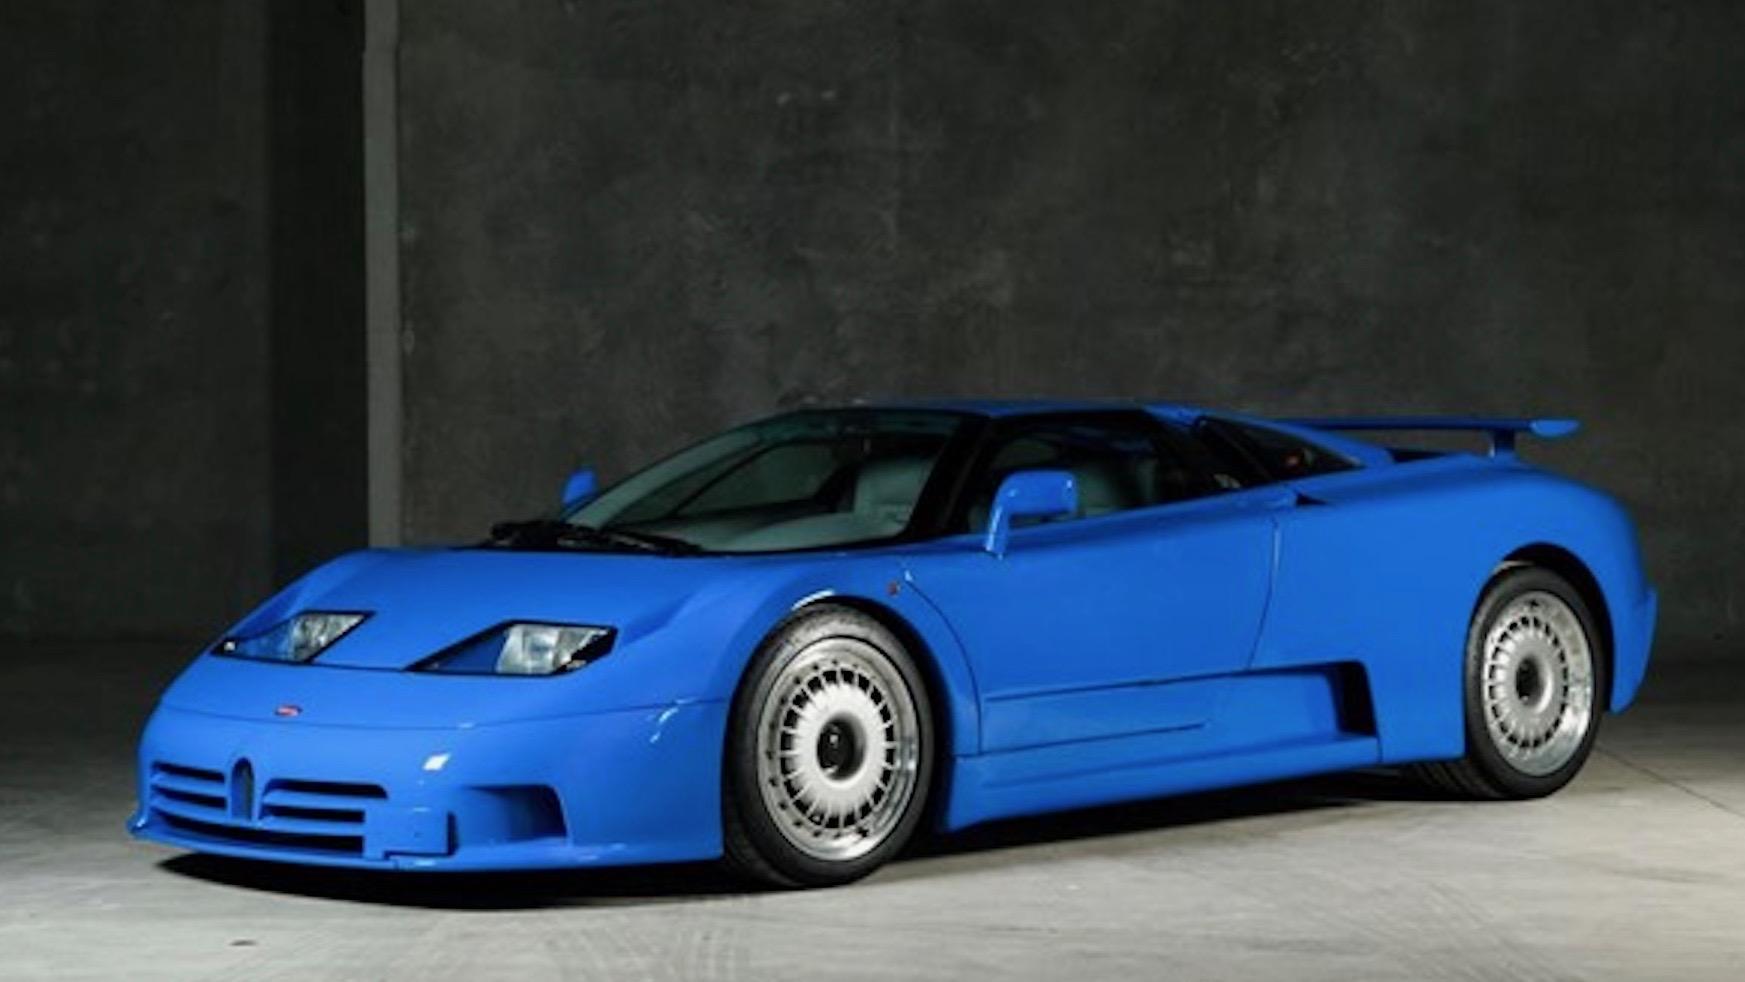 1994 bugatti eb 110 gt prototype photo via dupont registry 100798071 h